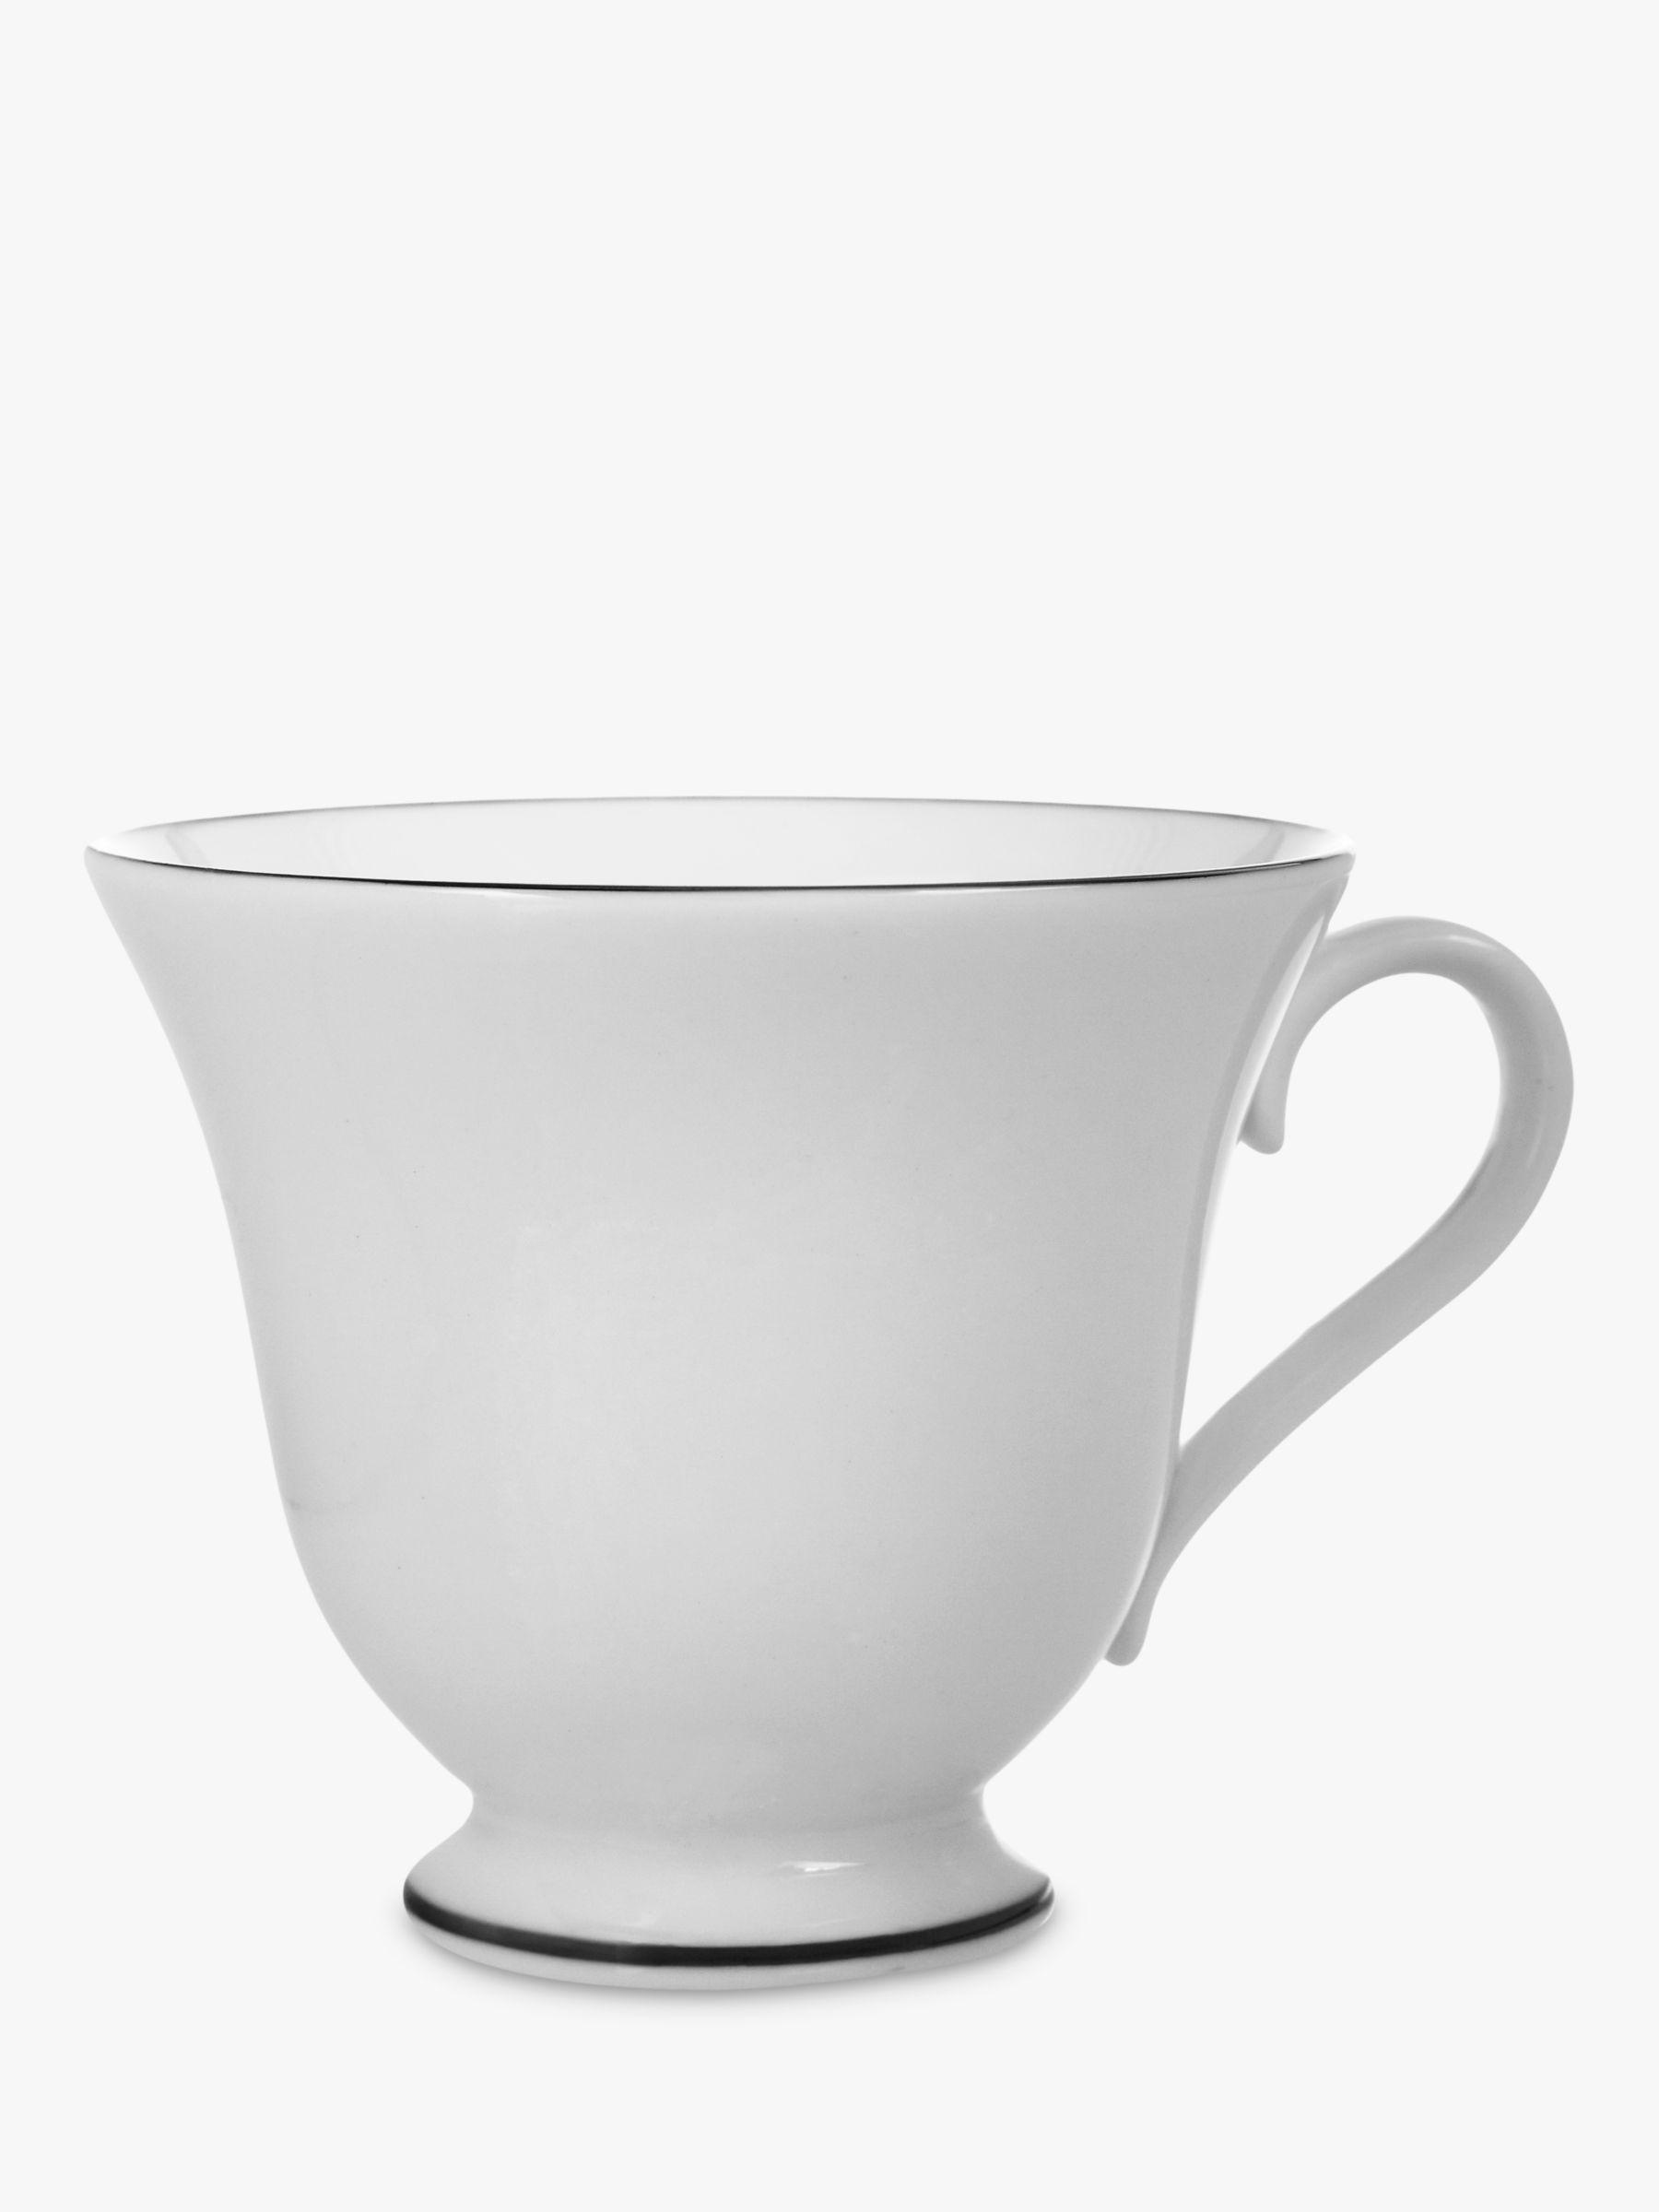 Wedgwood Wedgwood Signet Platinum Tea Cup